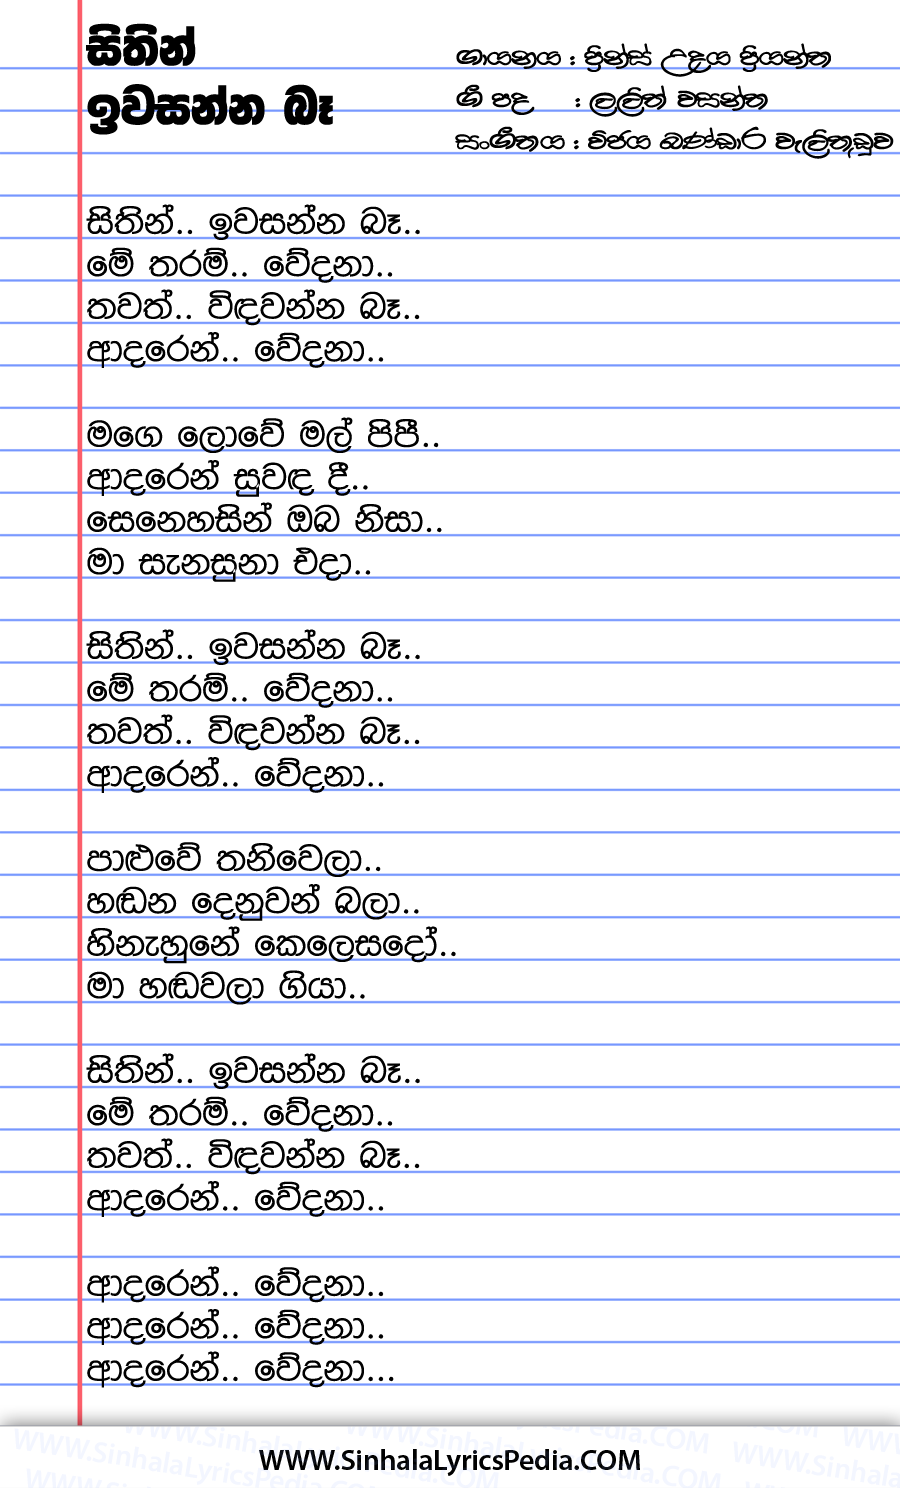 Sithin Iwasanna Ba Me Tharam Wedana Song Lyrics